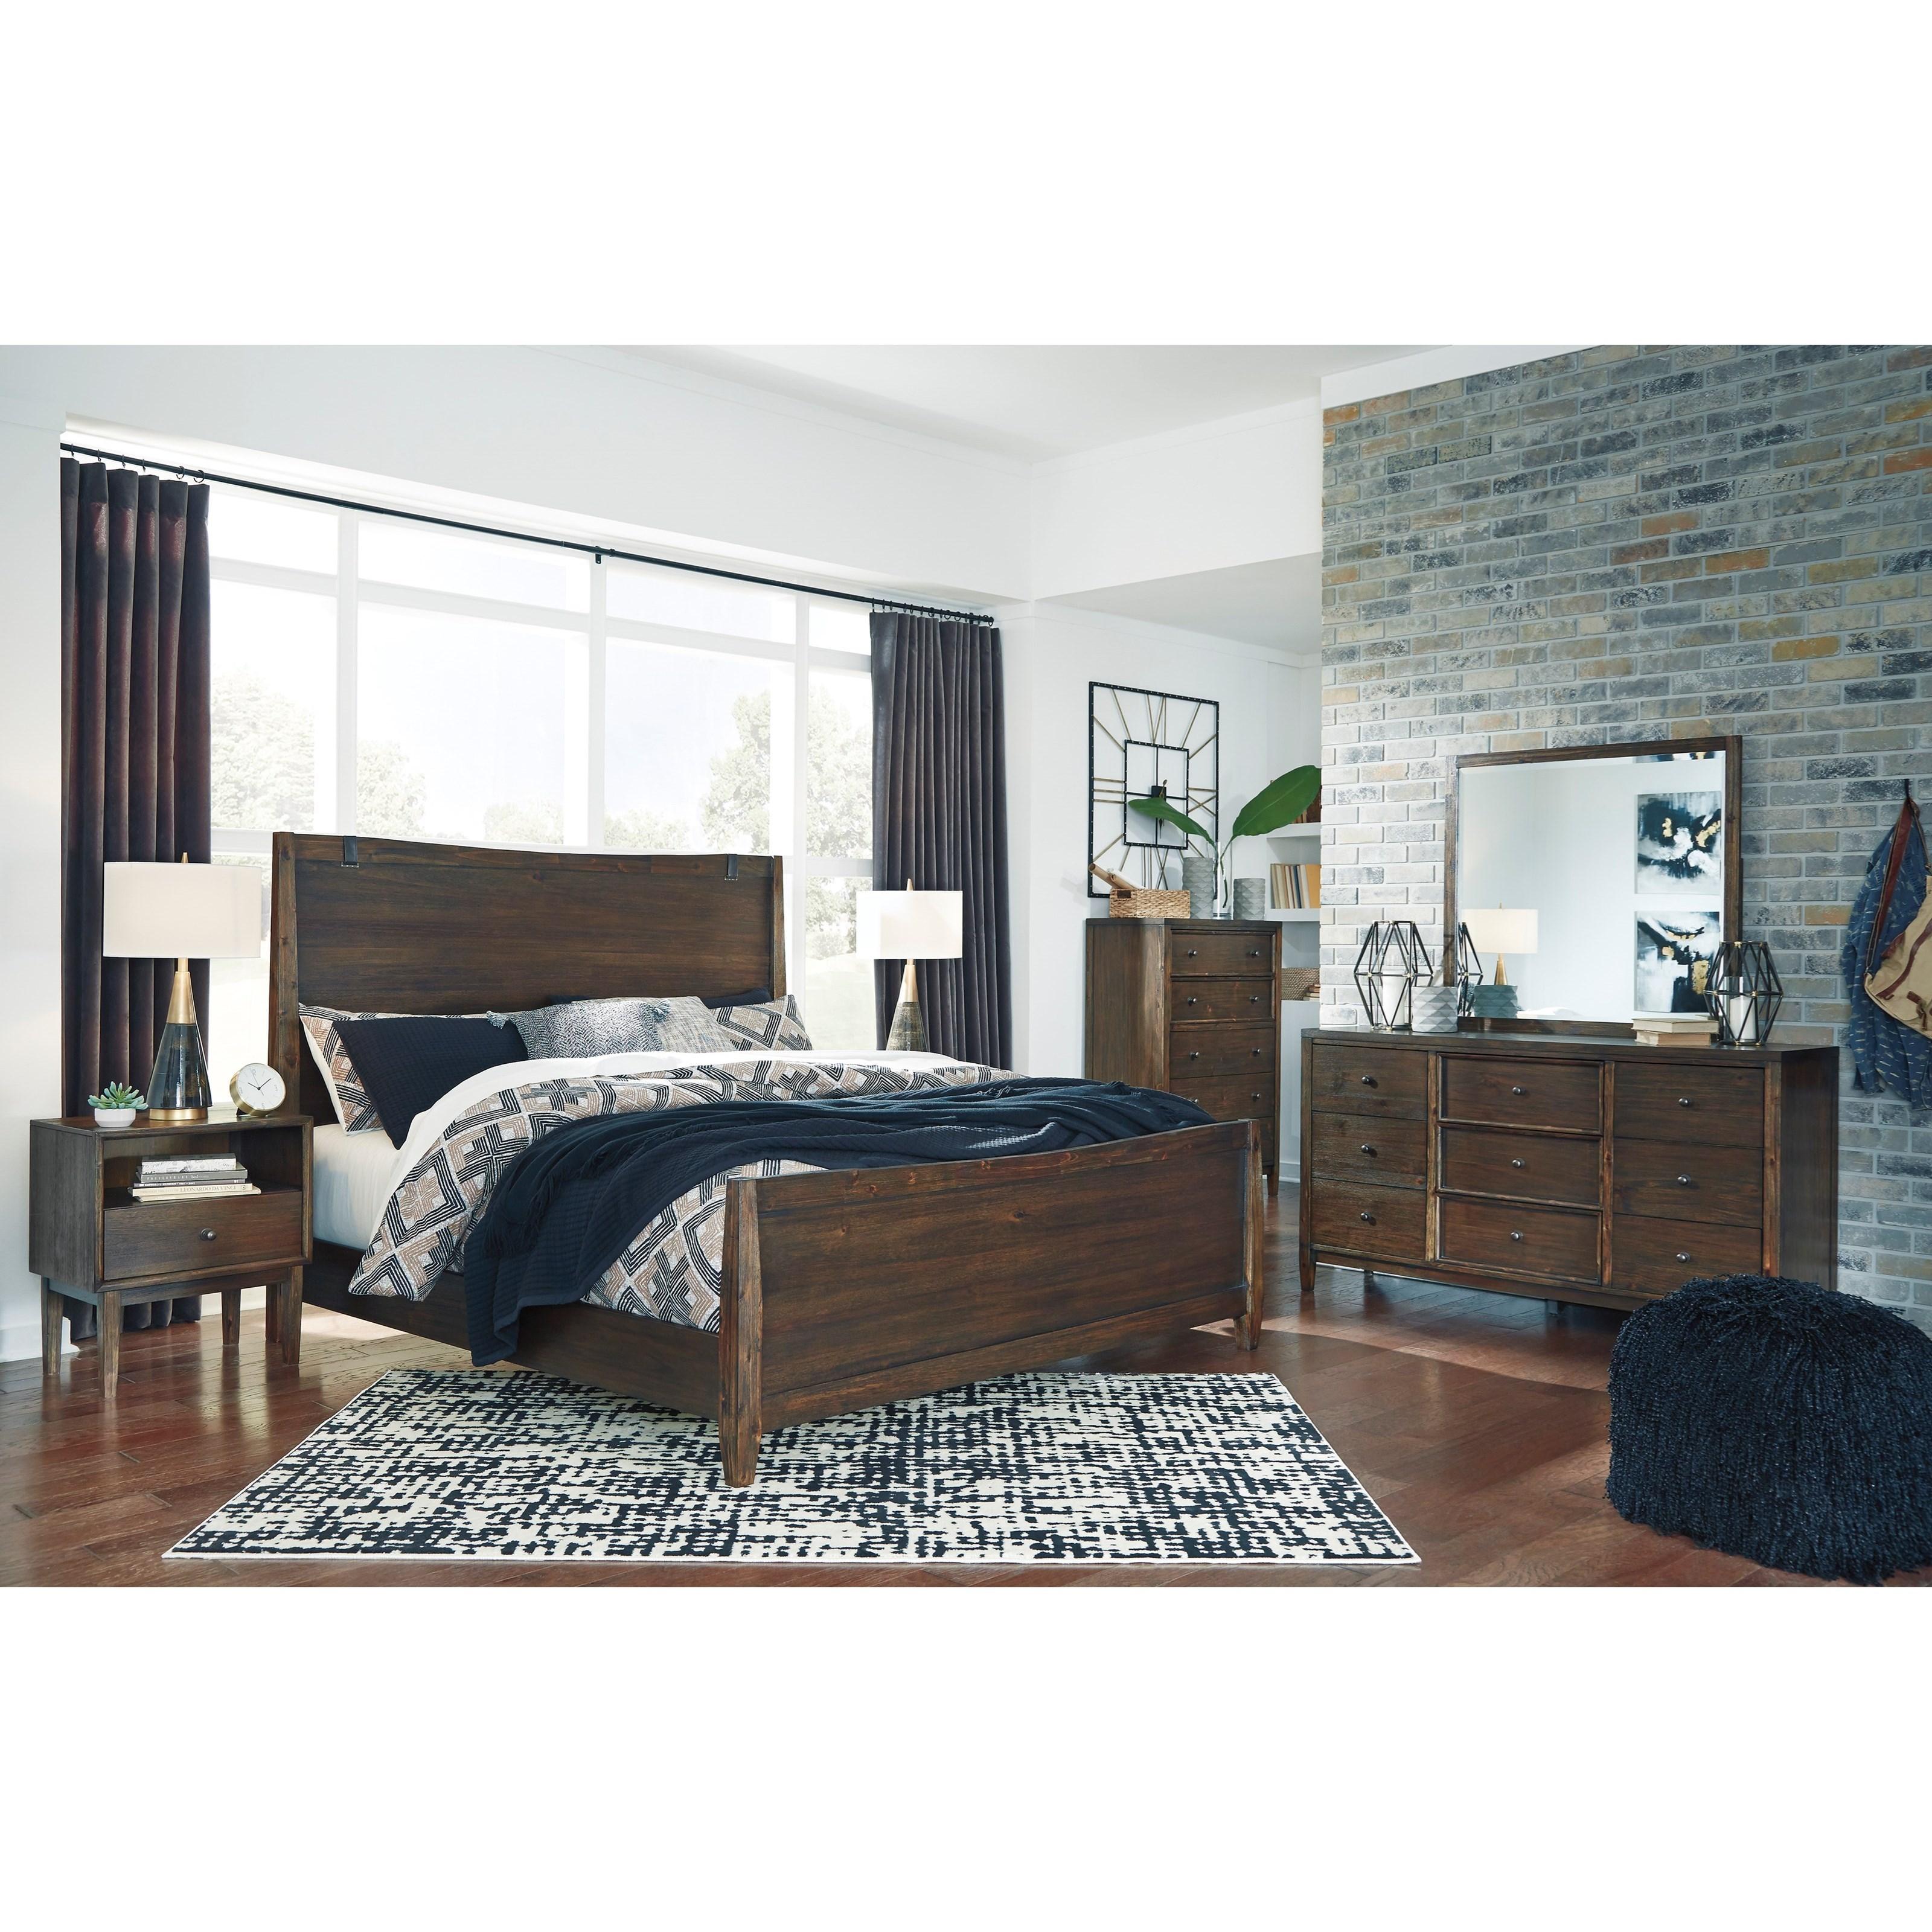 Kisper California King Bedroom Group by Ashley (Signature Design) at Johnny Janosik